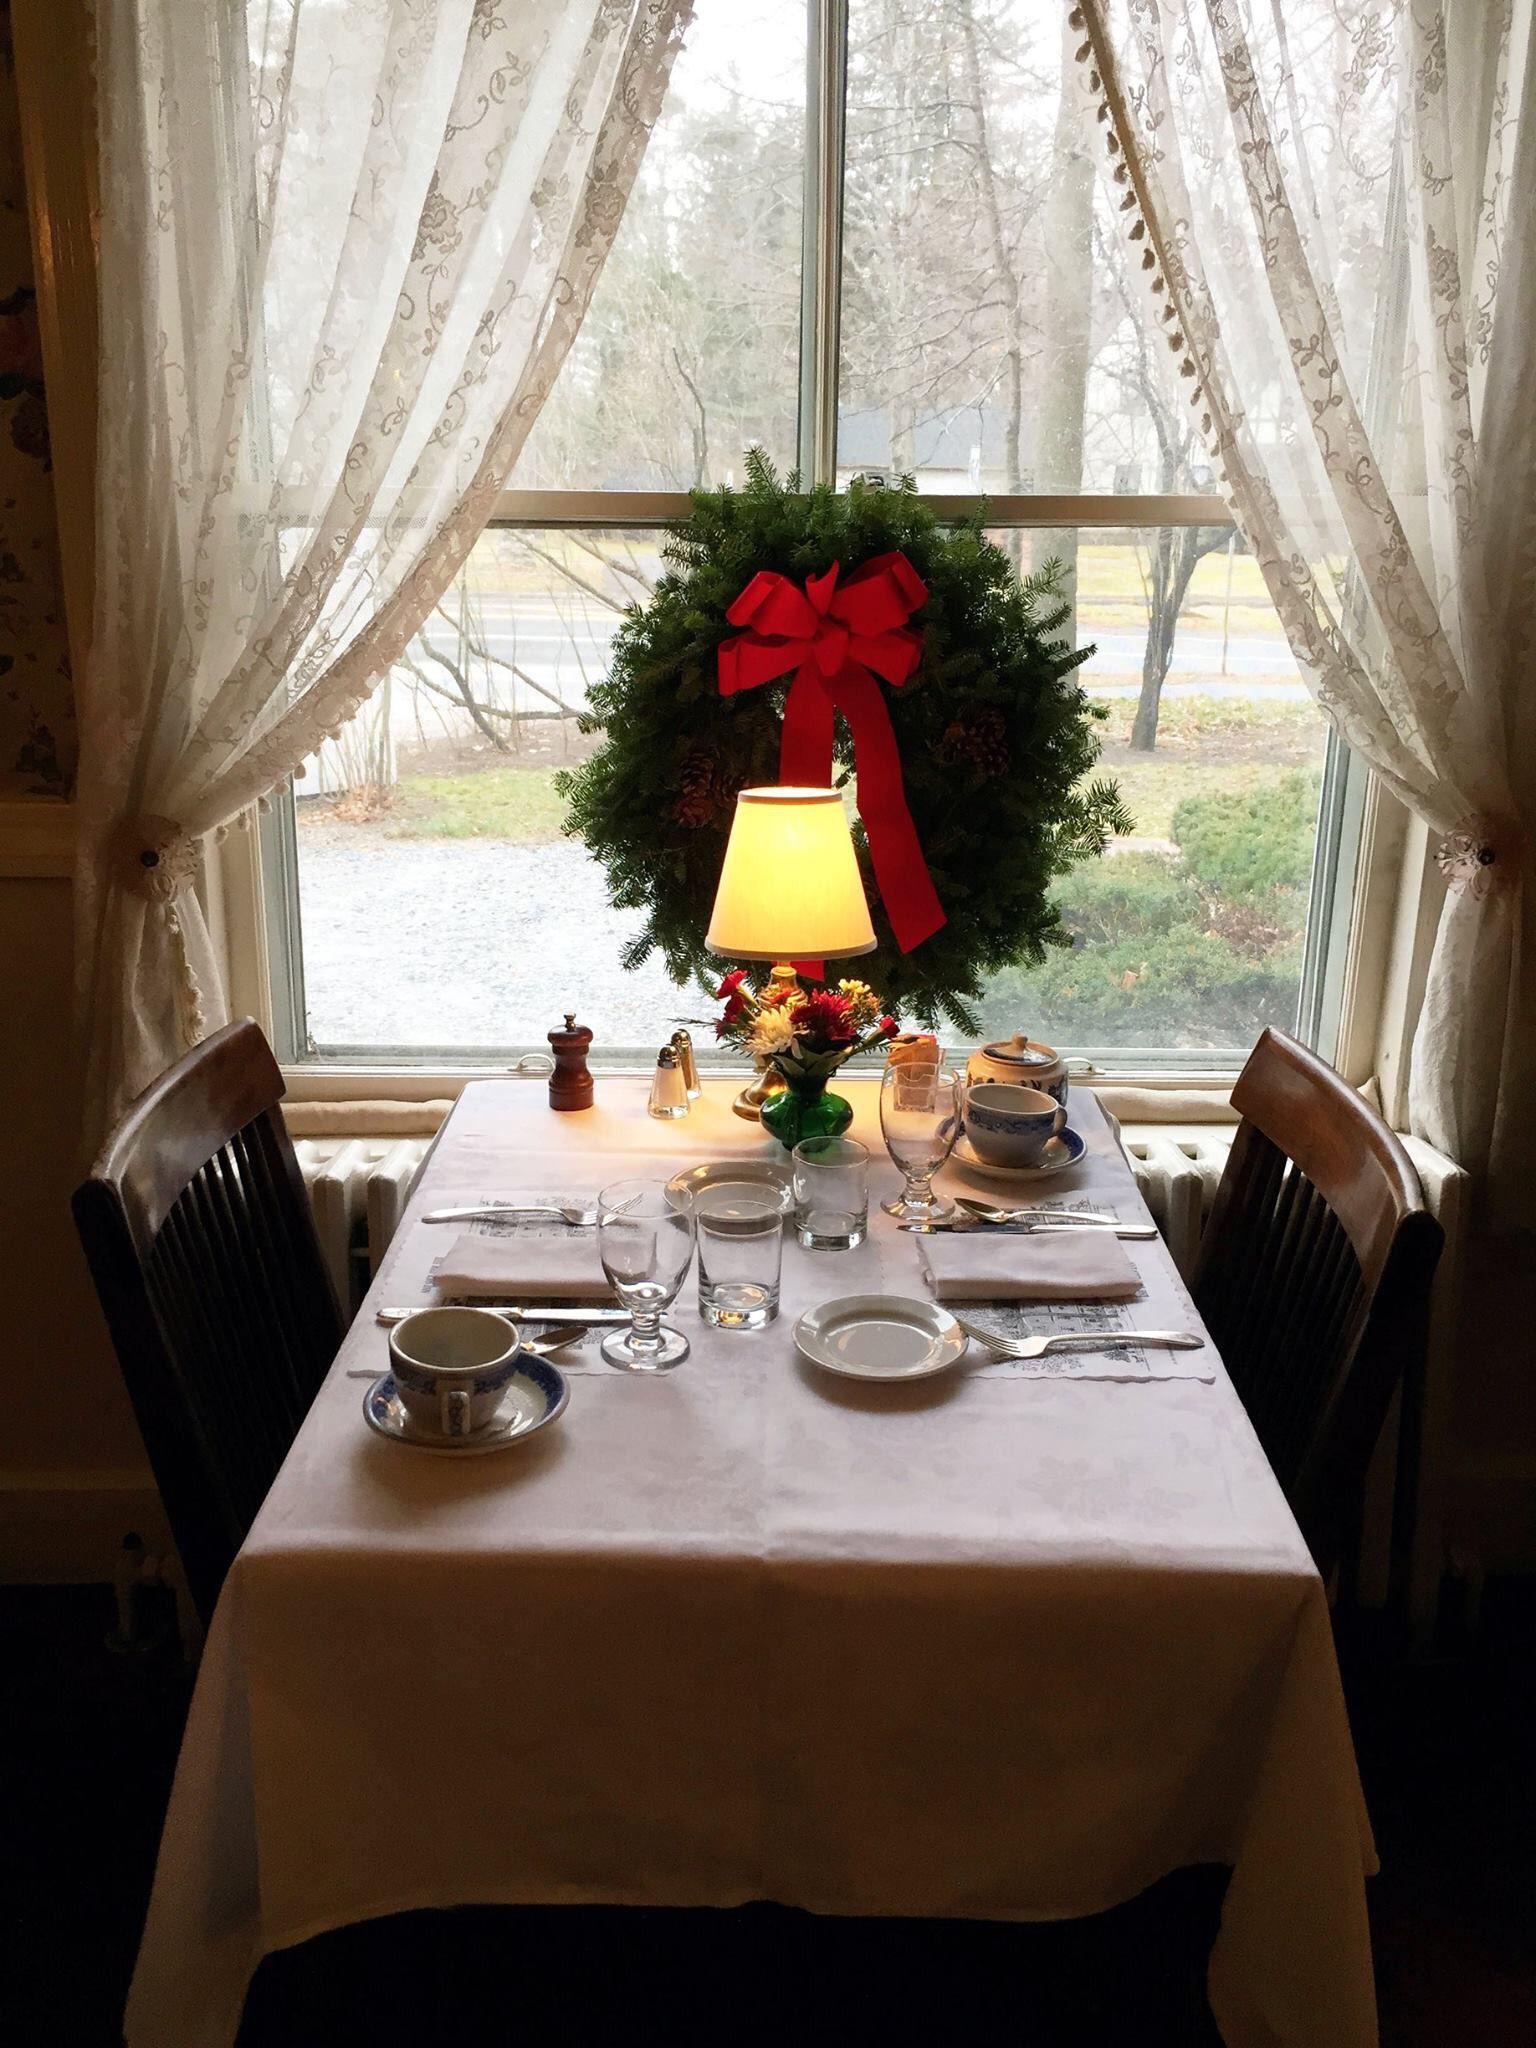 Breakfast During The Christmas Season At The Red Lion Inn Stockbridge Ma Red Lion Inn Holiday Hotel Country Inn